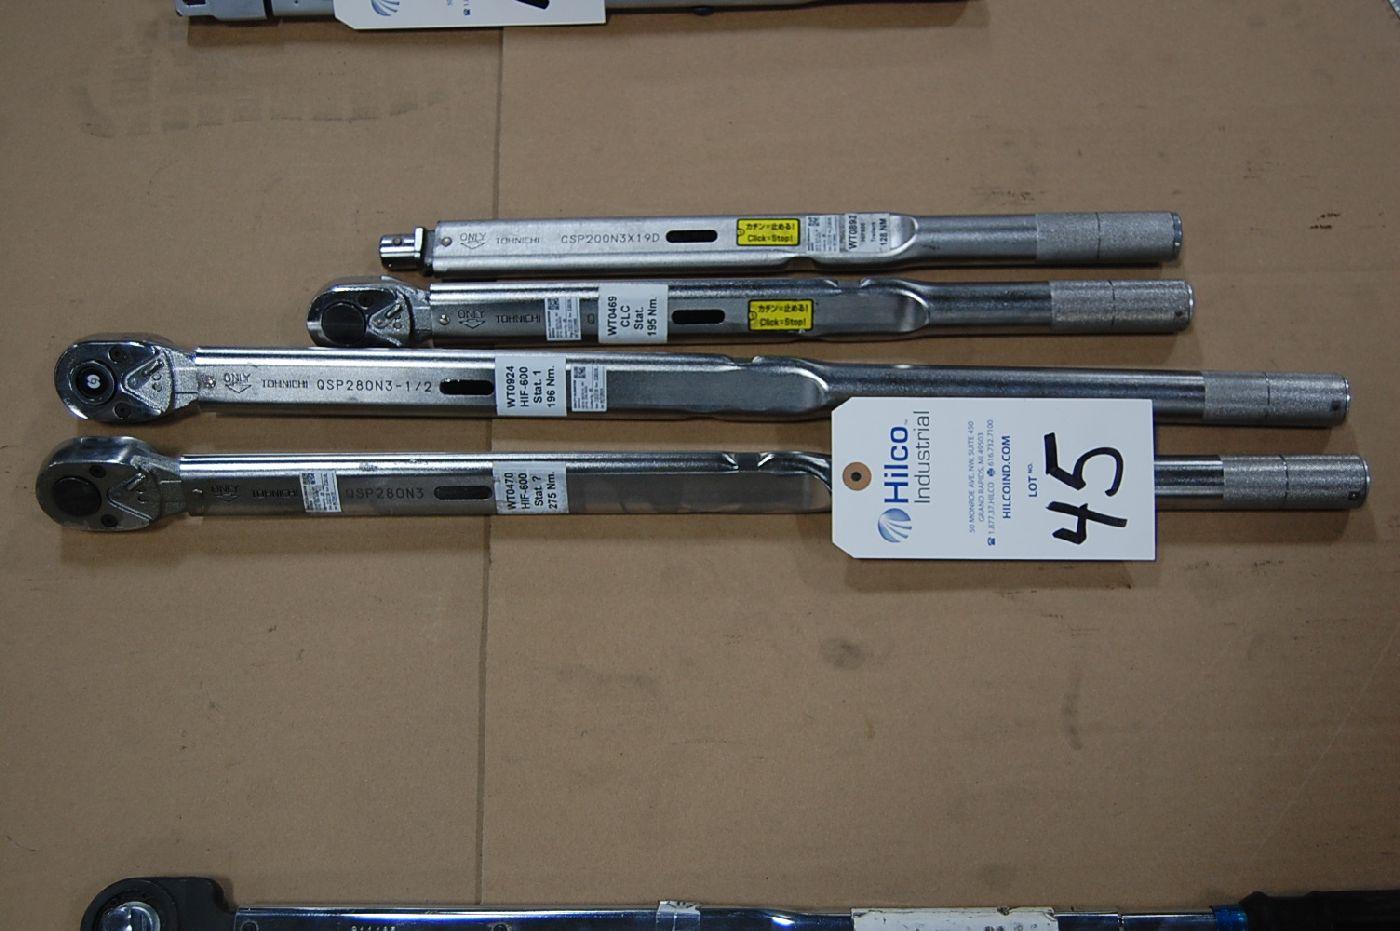 Tohnichi Model QSP280N3 Torque Wrench